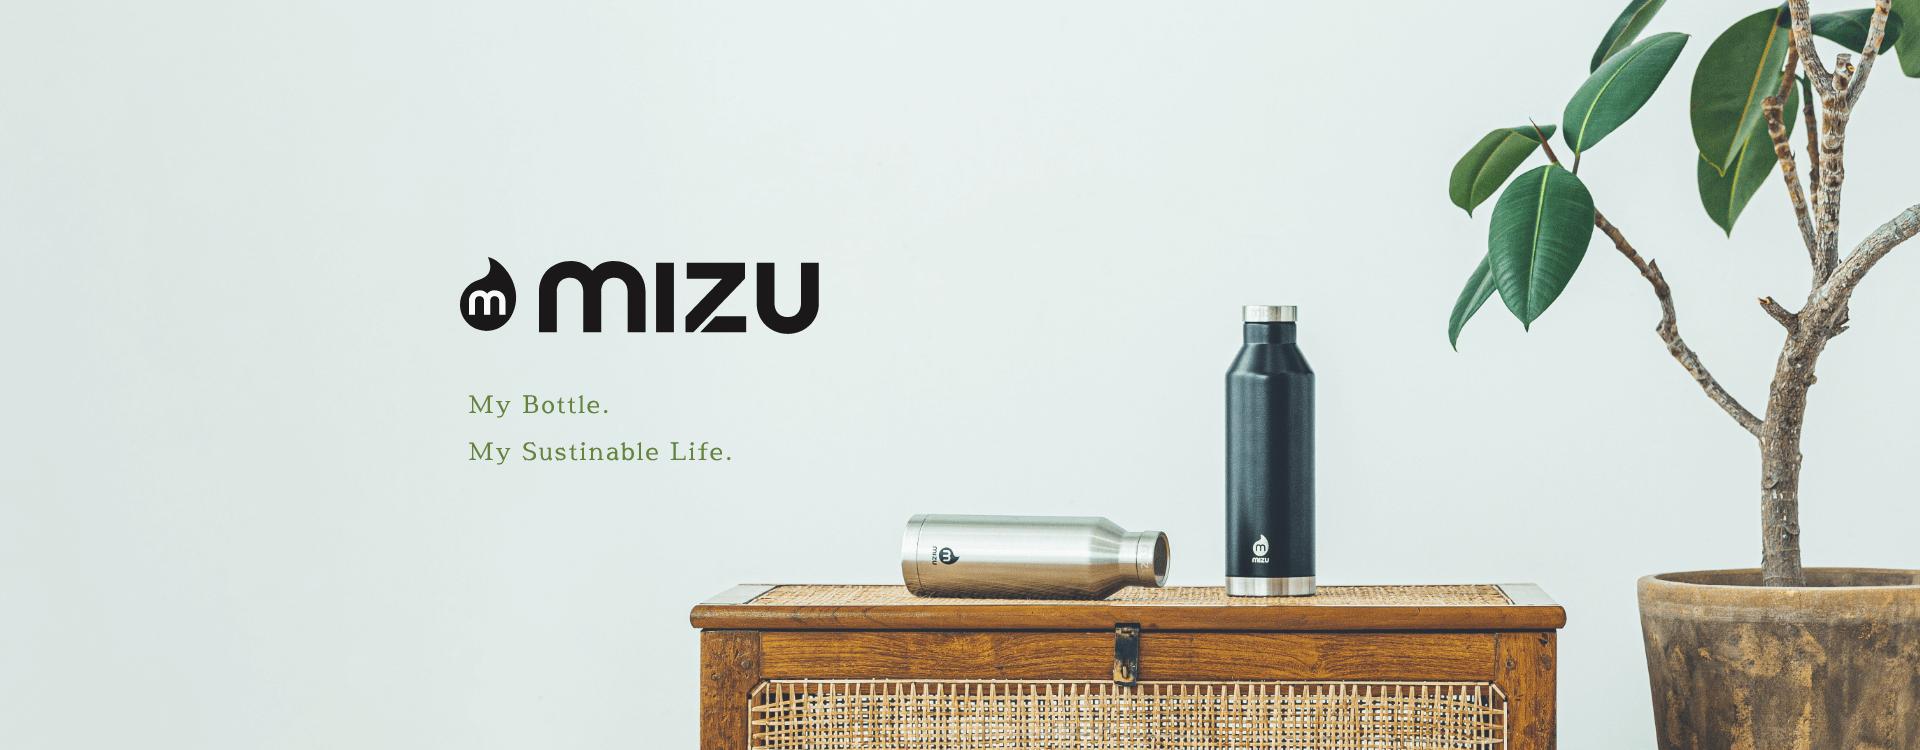 Mizuボトル